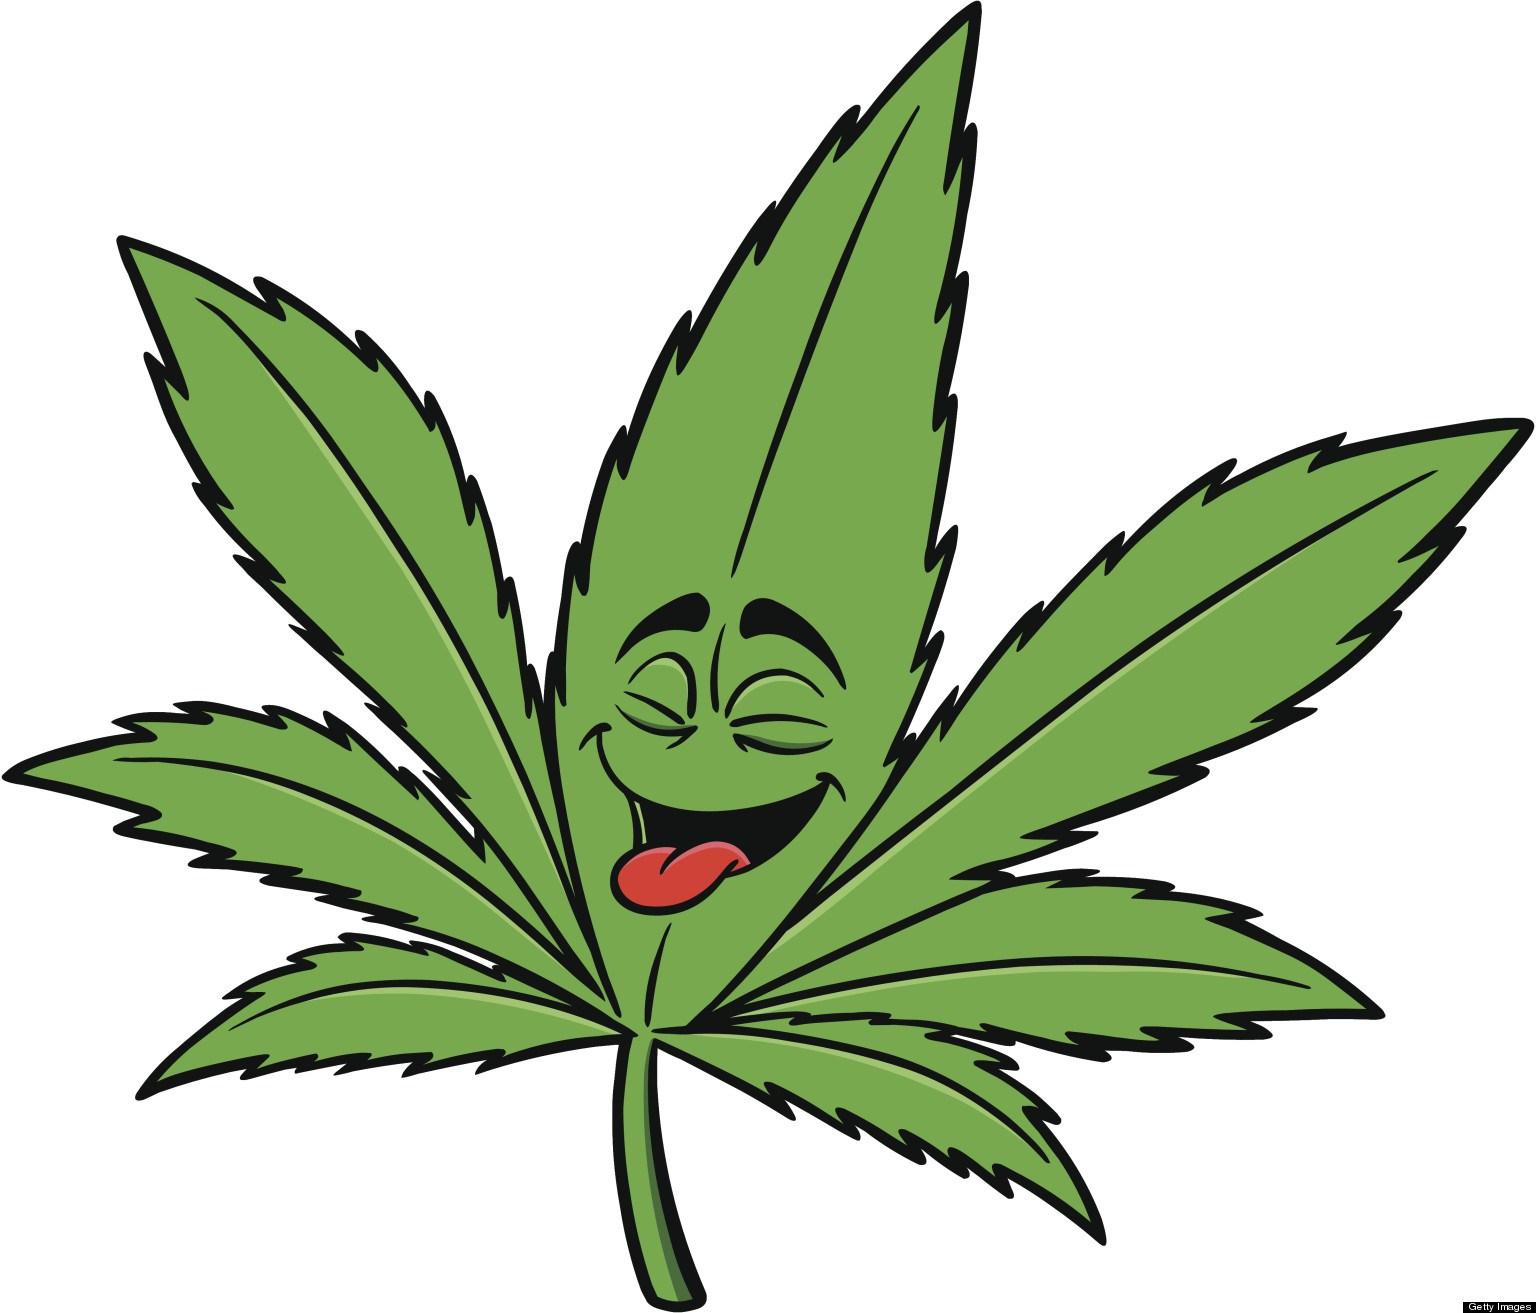 Free Cannabis Cliparts, Download Free Clip Art, Free Clip.